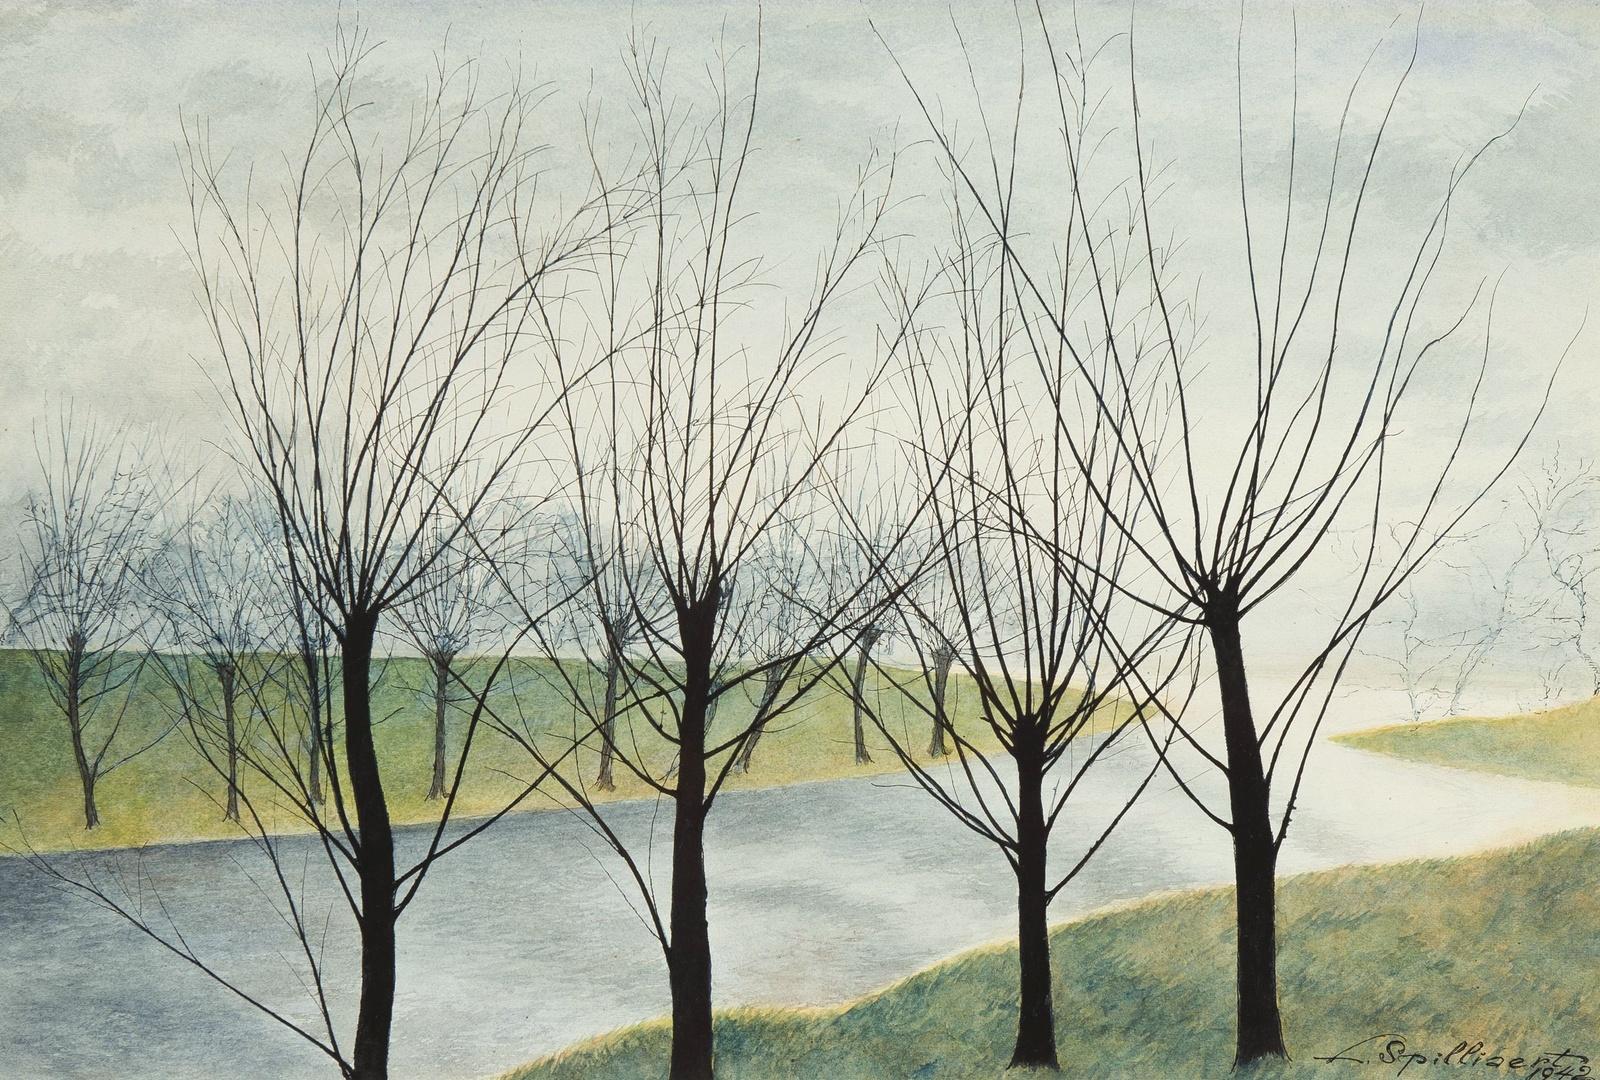 1942_Ивы на берегу (Willows at the waterside)_37.5 х 56_бумага, акварель_Частное собрание.jpg